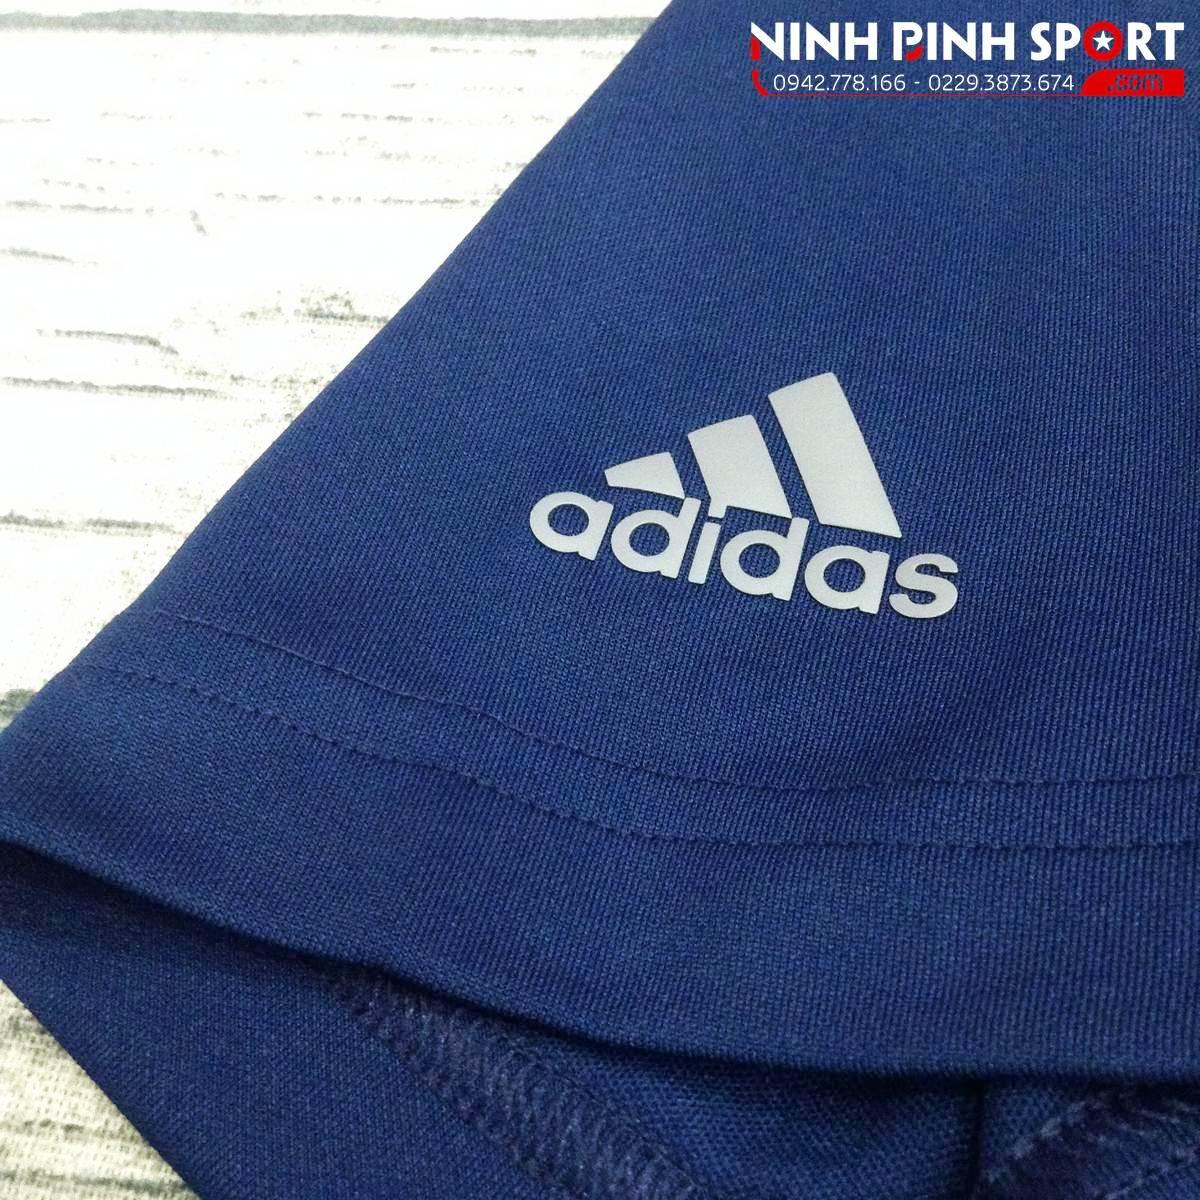 Áo Thể Thao Adidas Golf Adidas Essential Textured Polo - Blue CV6393